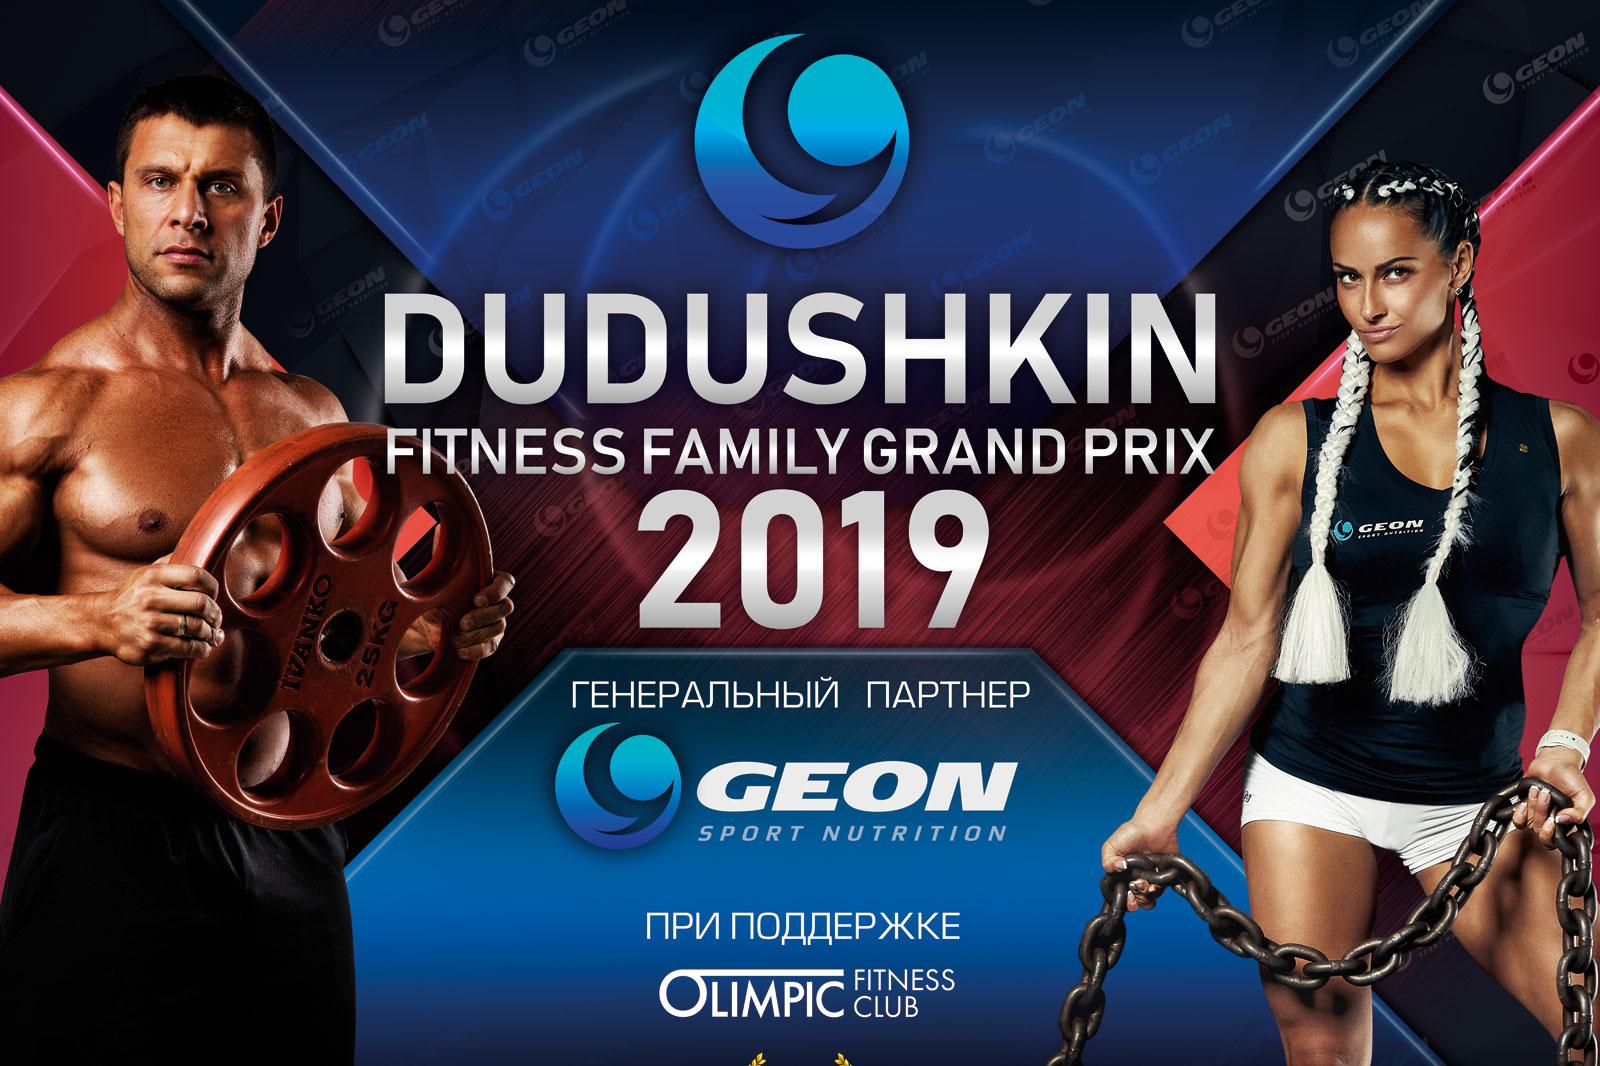 Протоколы: Grand-Prix Dudushkin Fitness Family - 2019